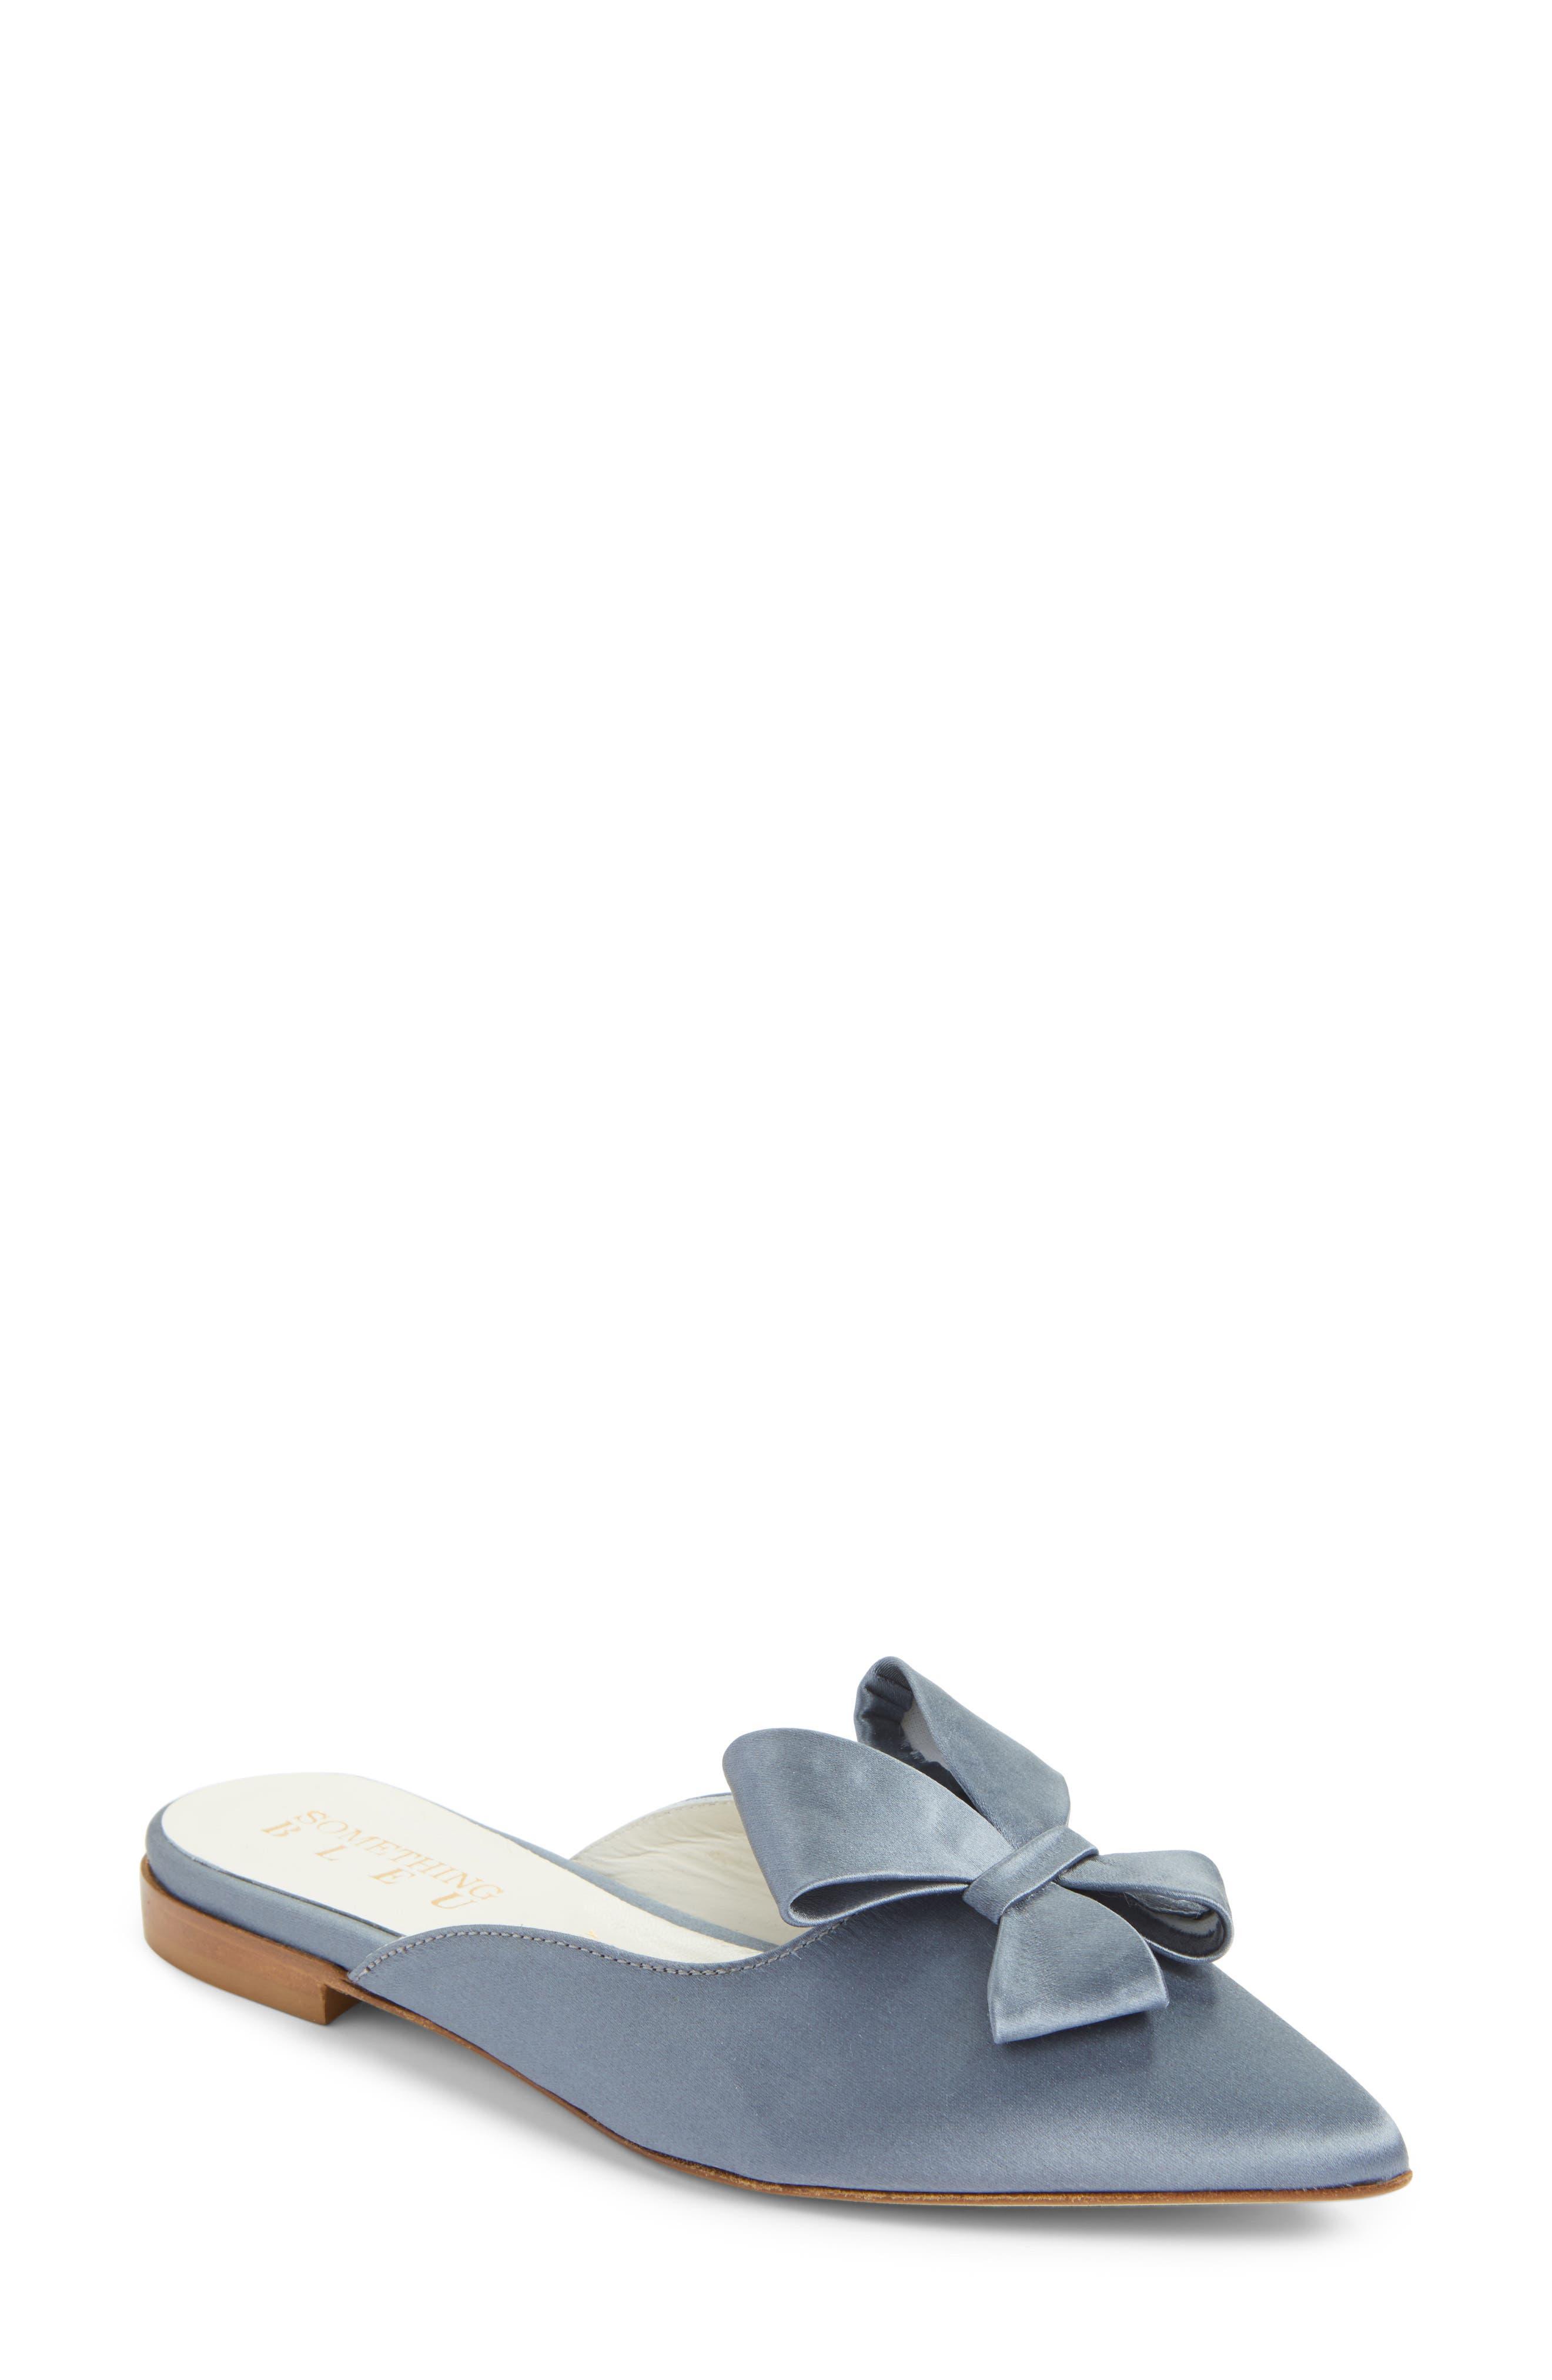 Something Bleu Bow Loafer Mule (Women)